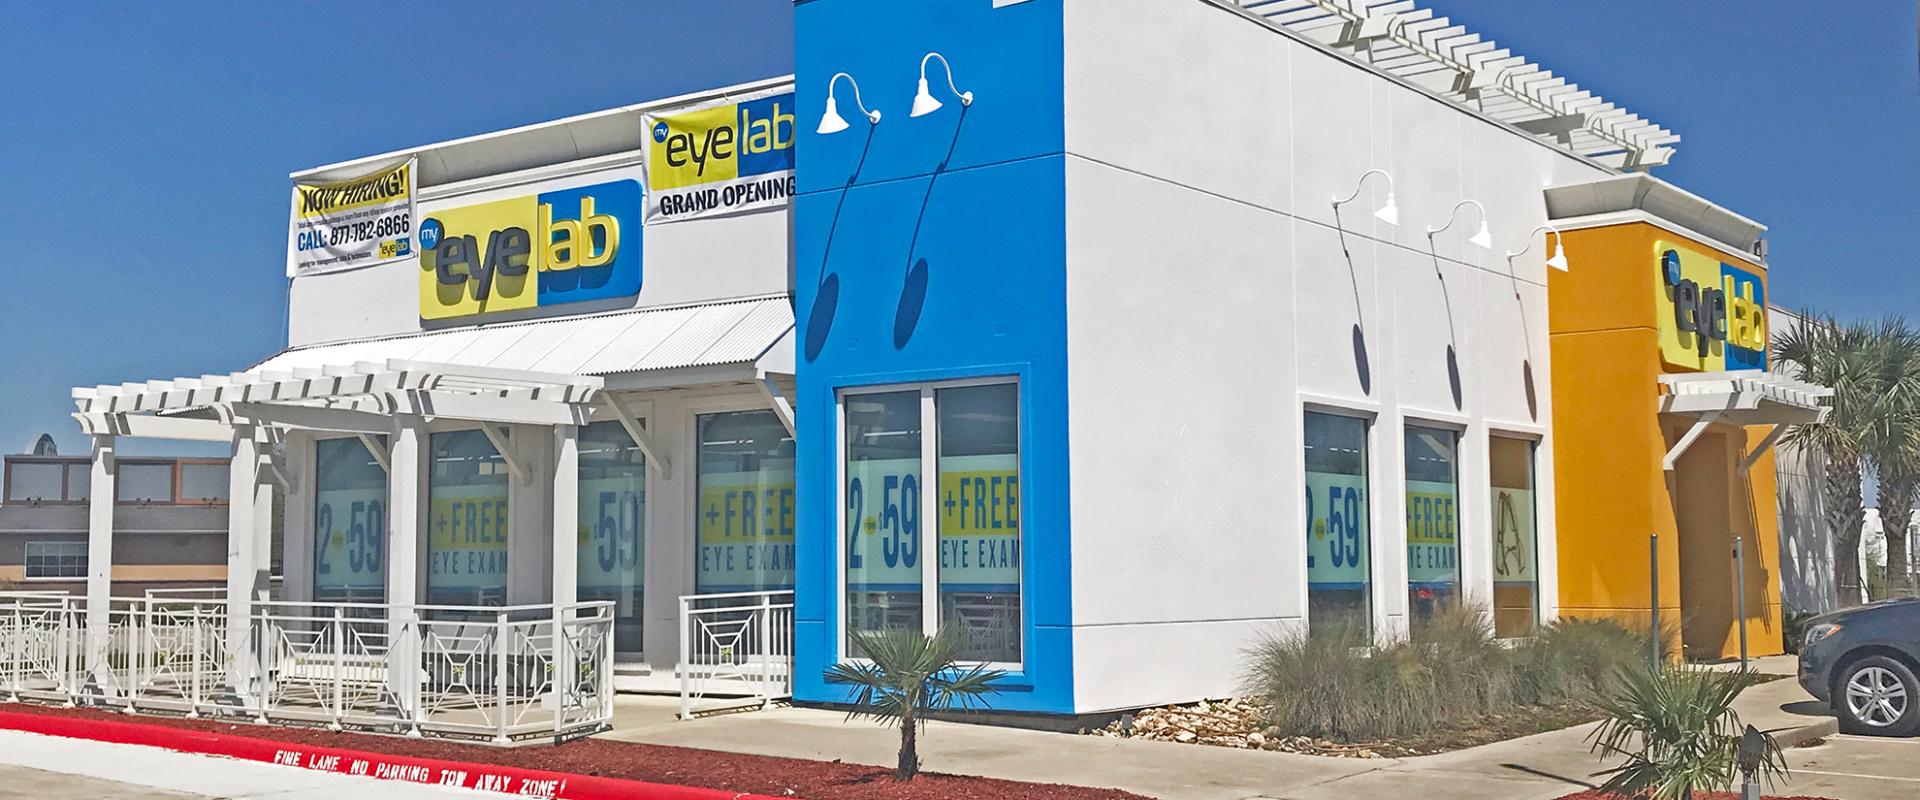 For Sale- My Eyelab- Pearland (Houston) TX